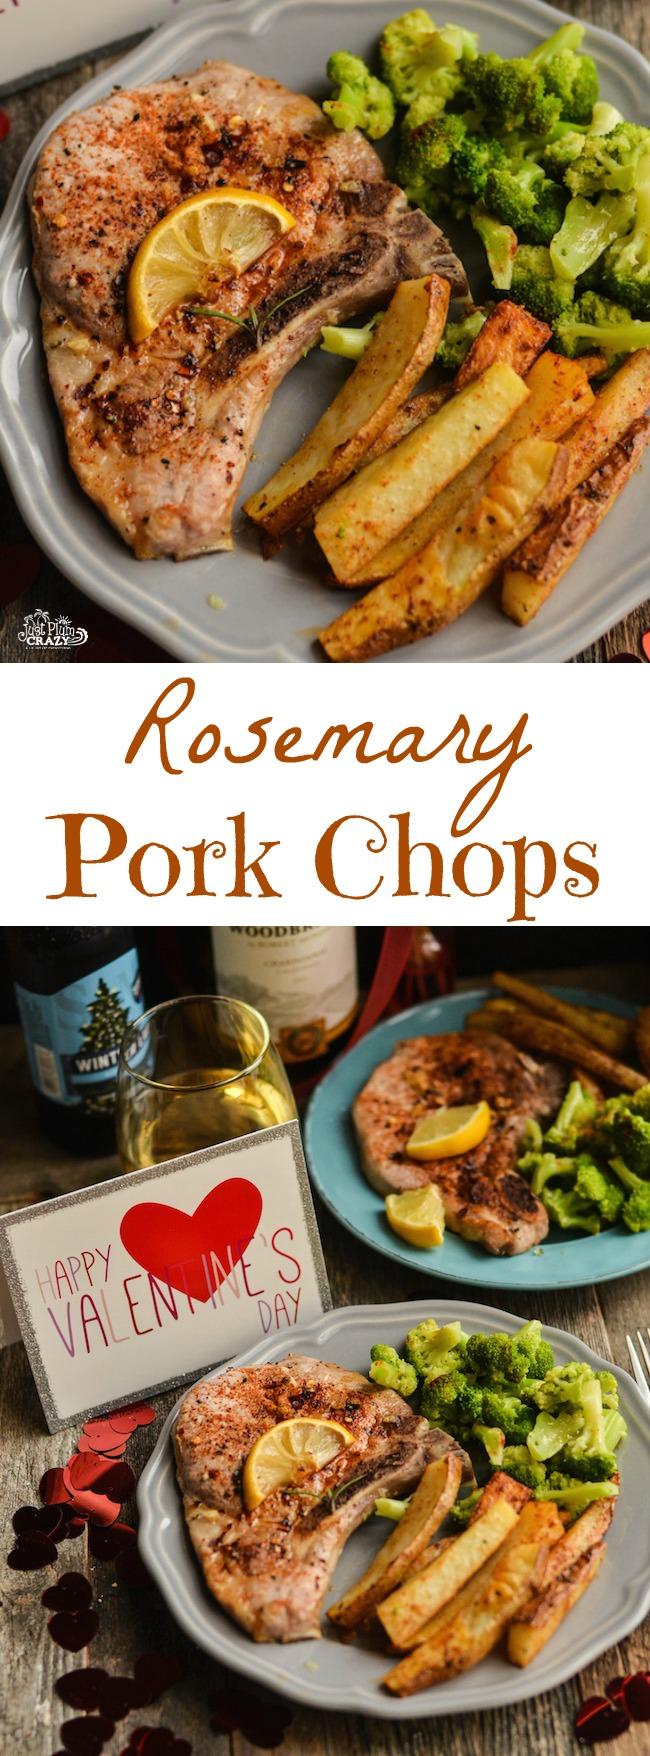 ... pork chops pan seared pork chops braised pork chops mom s perfect pork